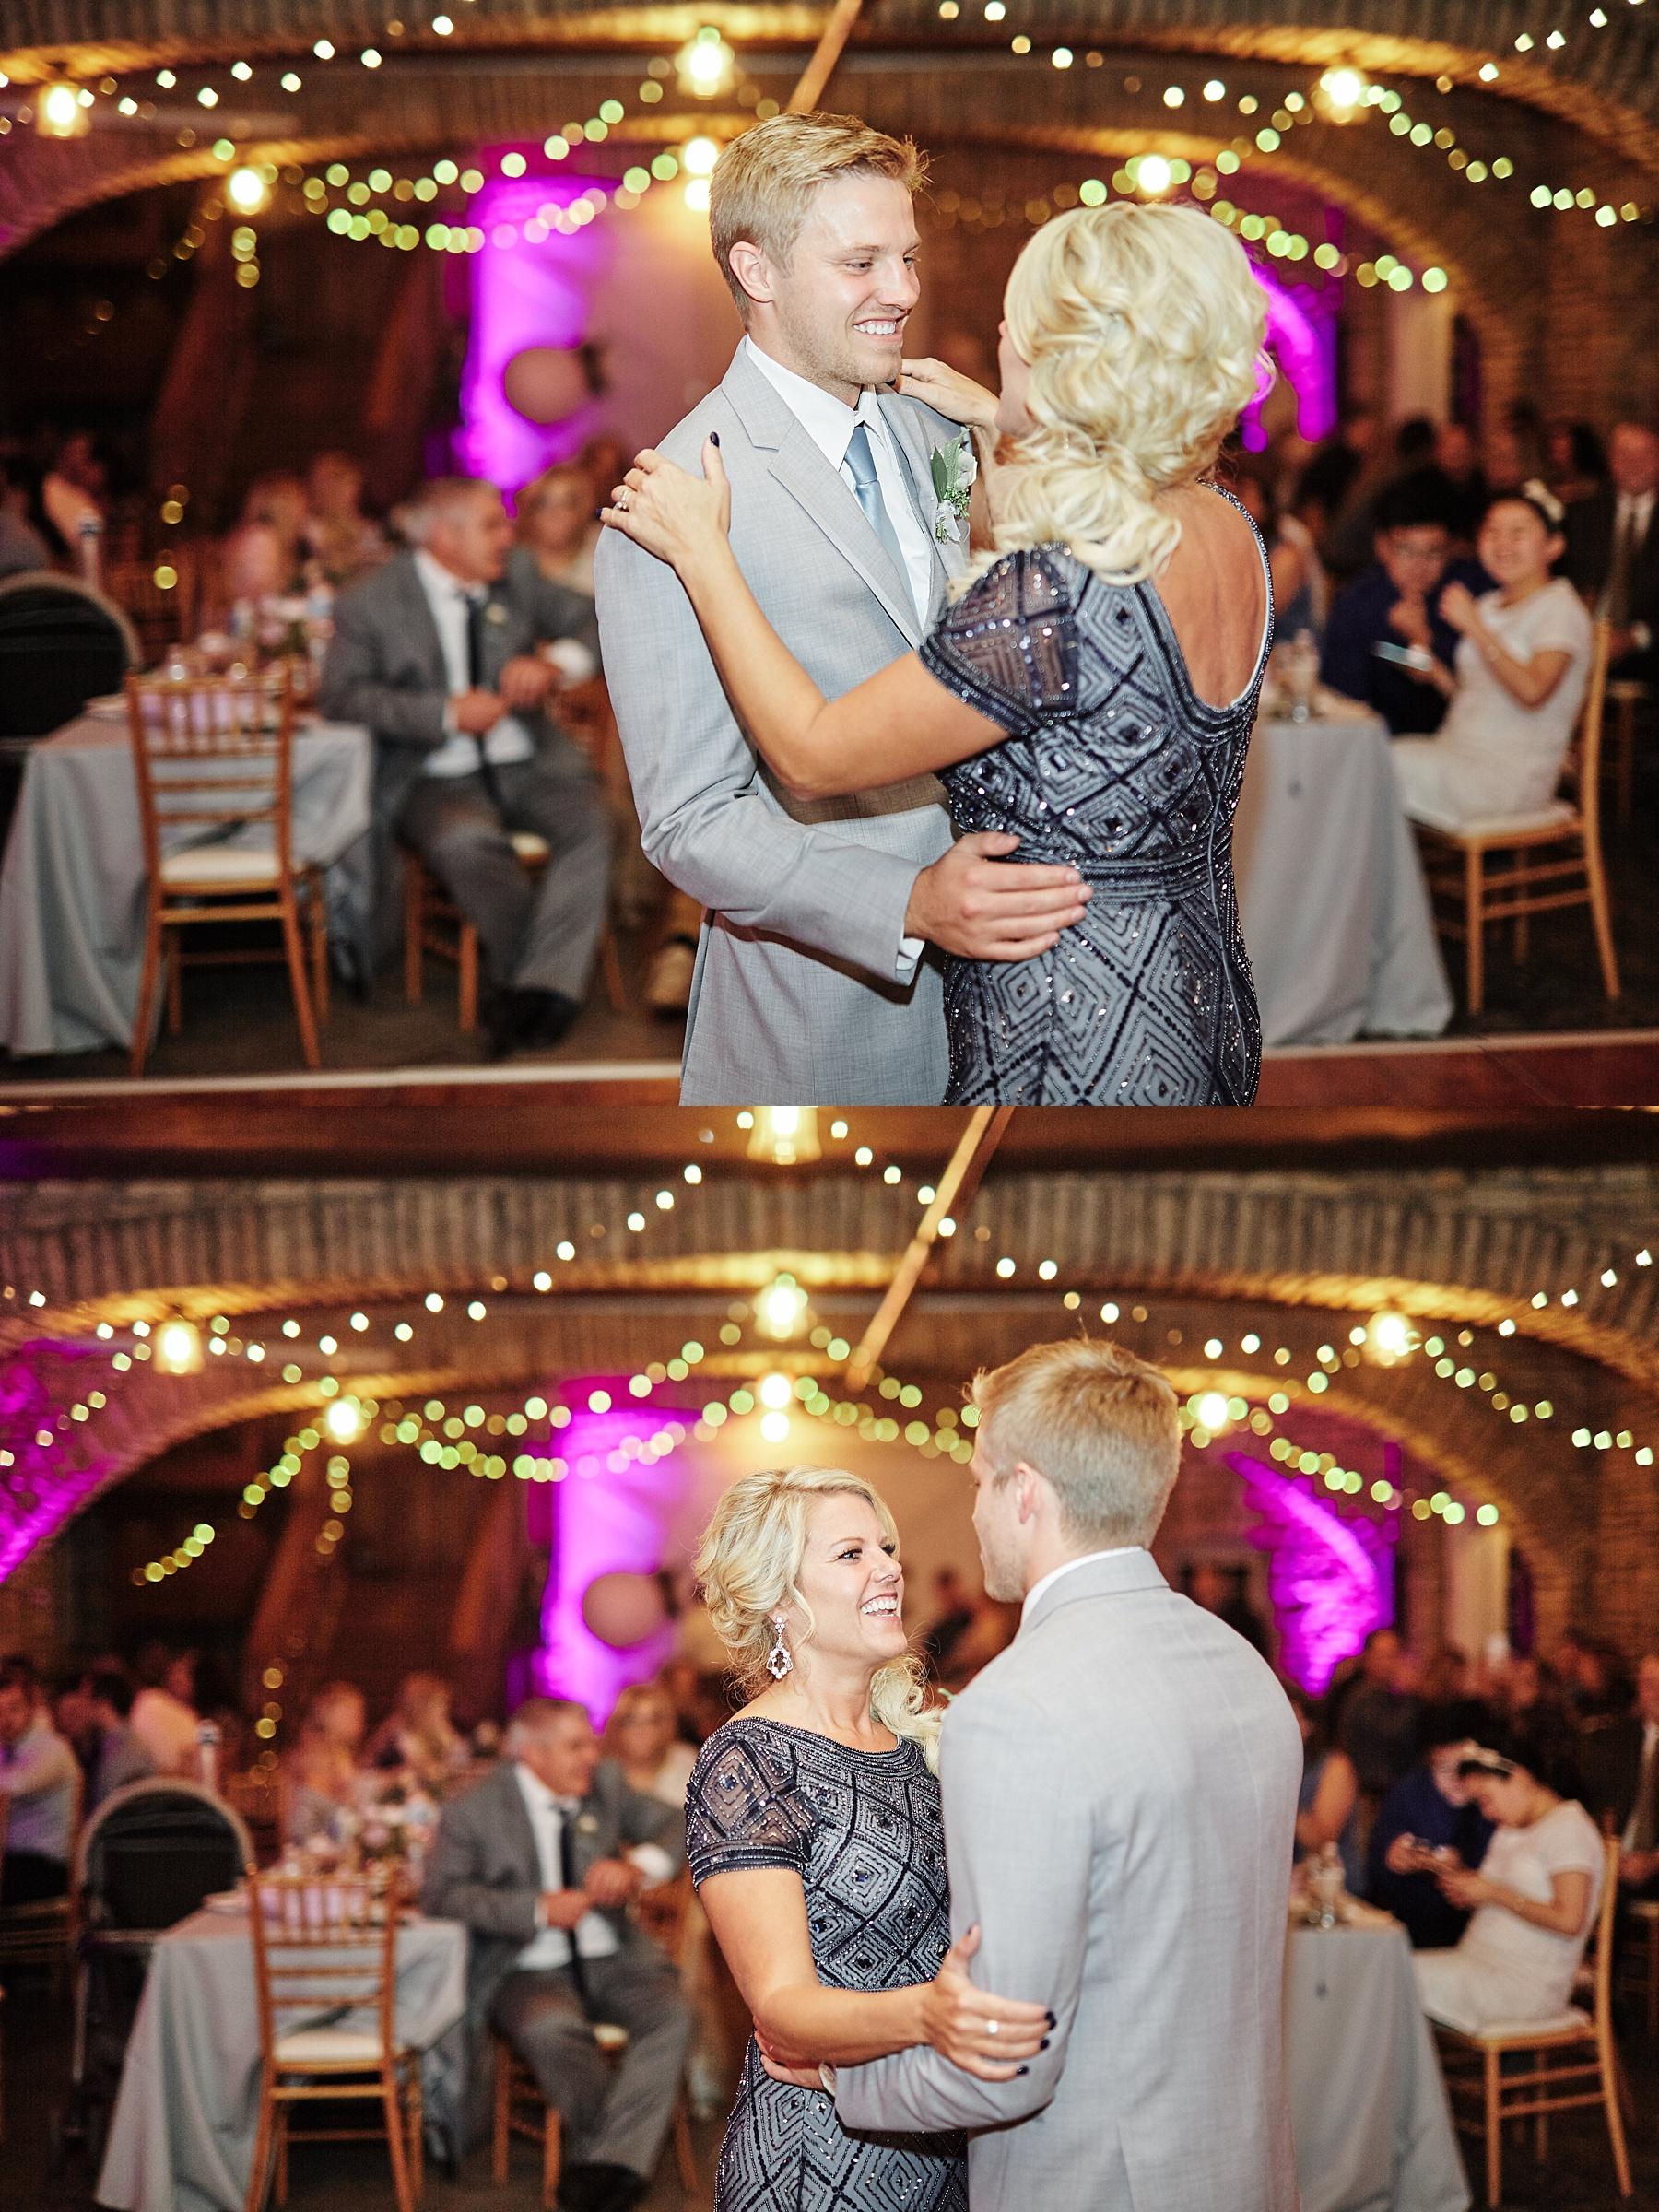 Maywood-Stone-Barn-Wedding-Rochester-Minnesota-Perry-James-Photo_0696.jpg